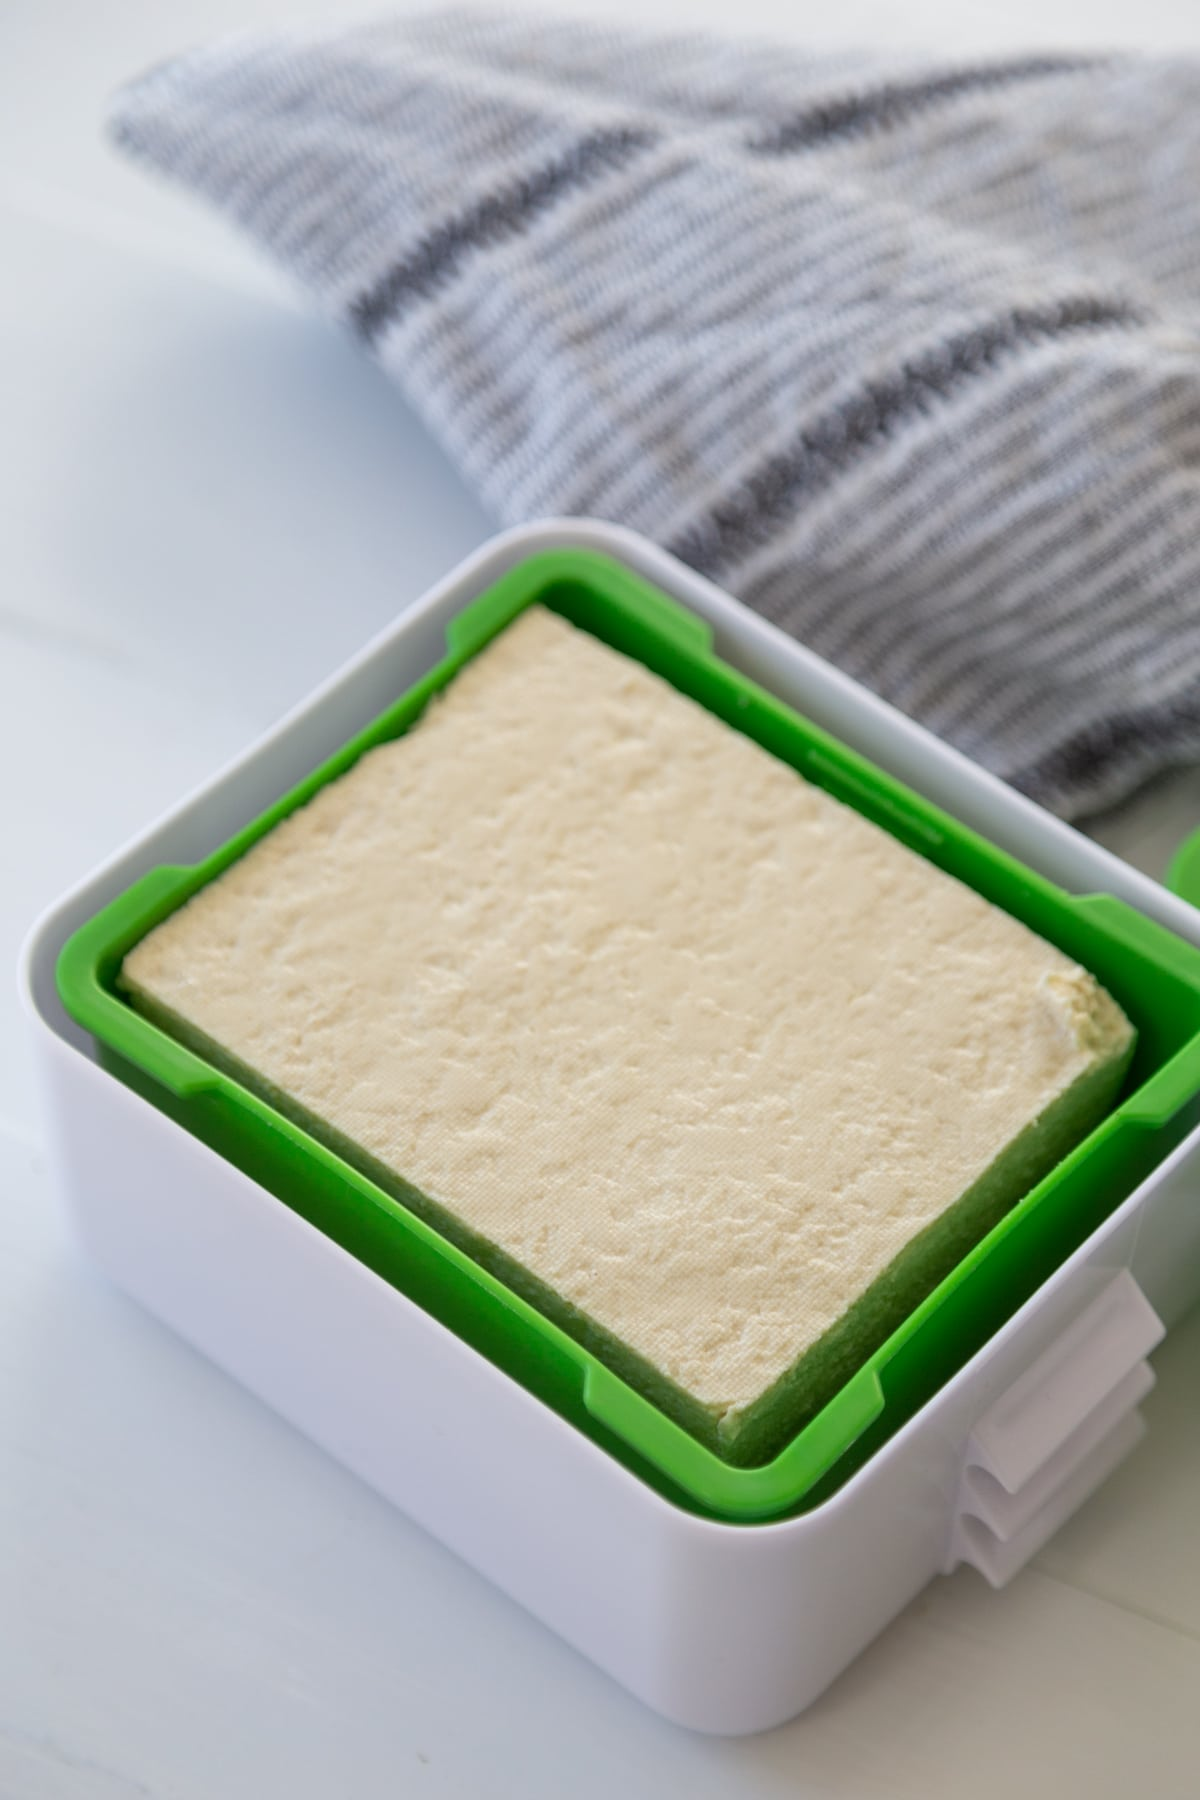 A block of tofu in a green and white tofu press.